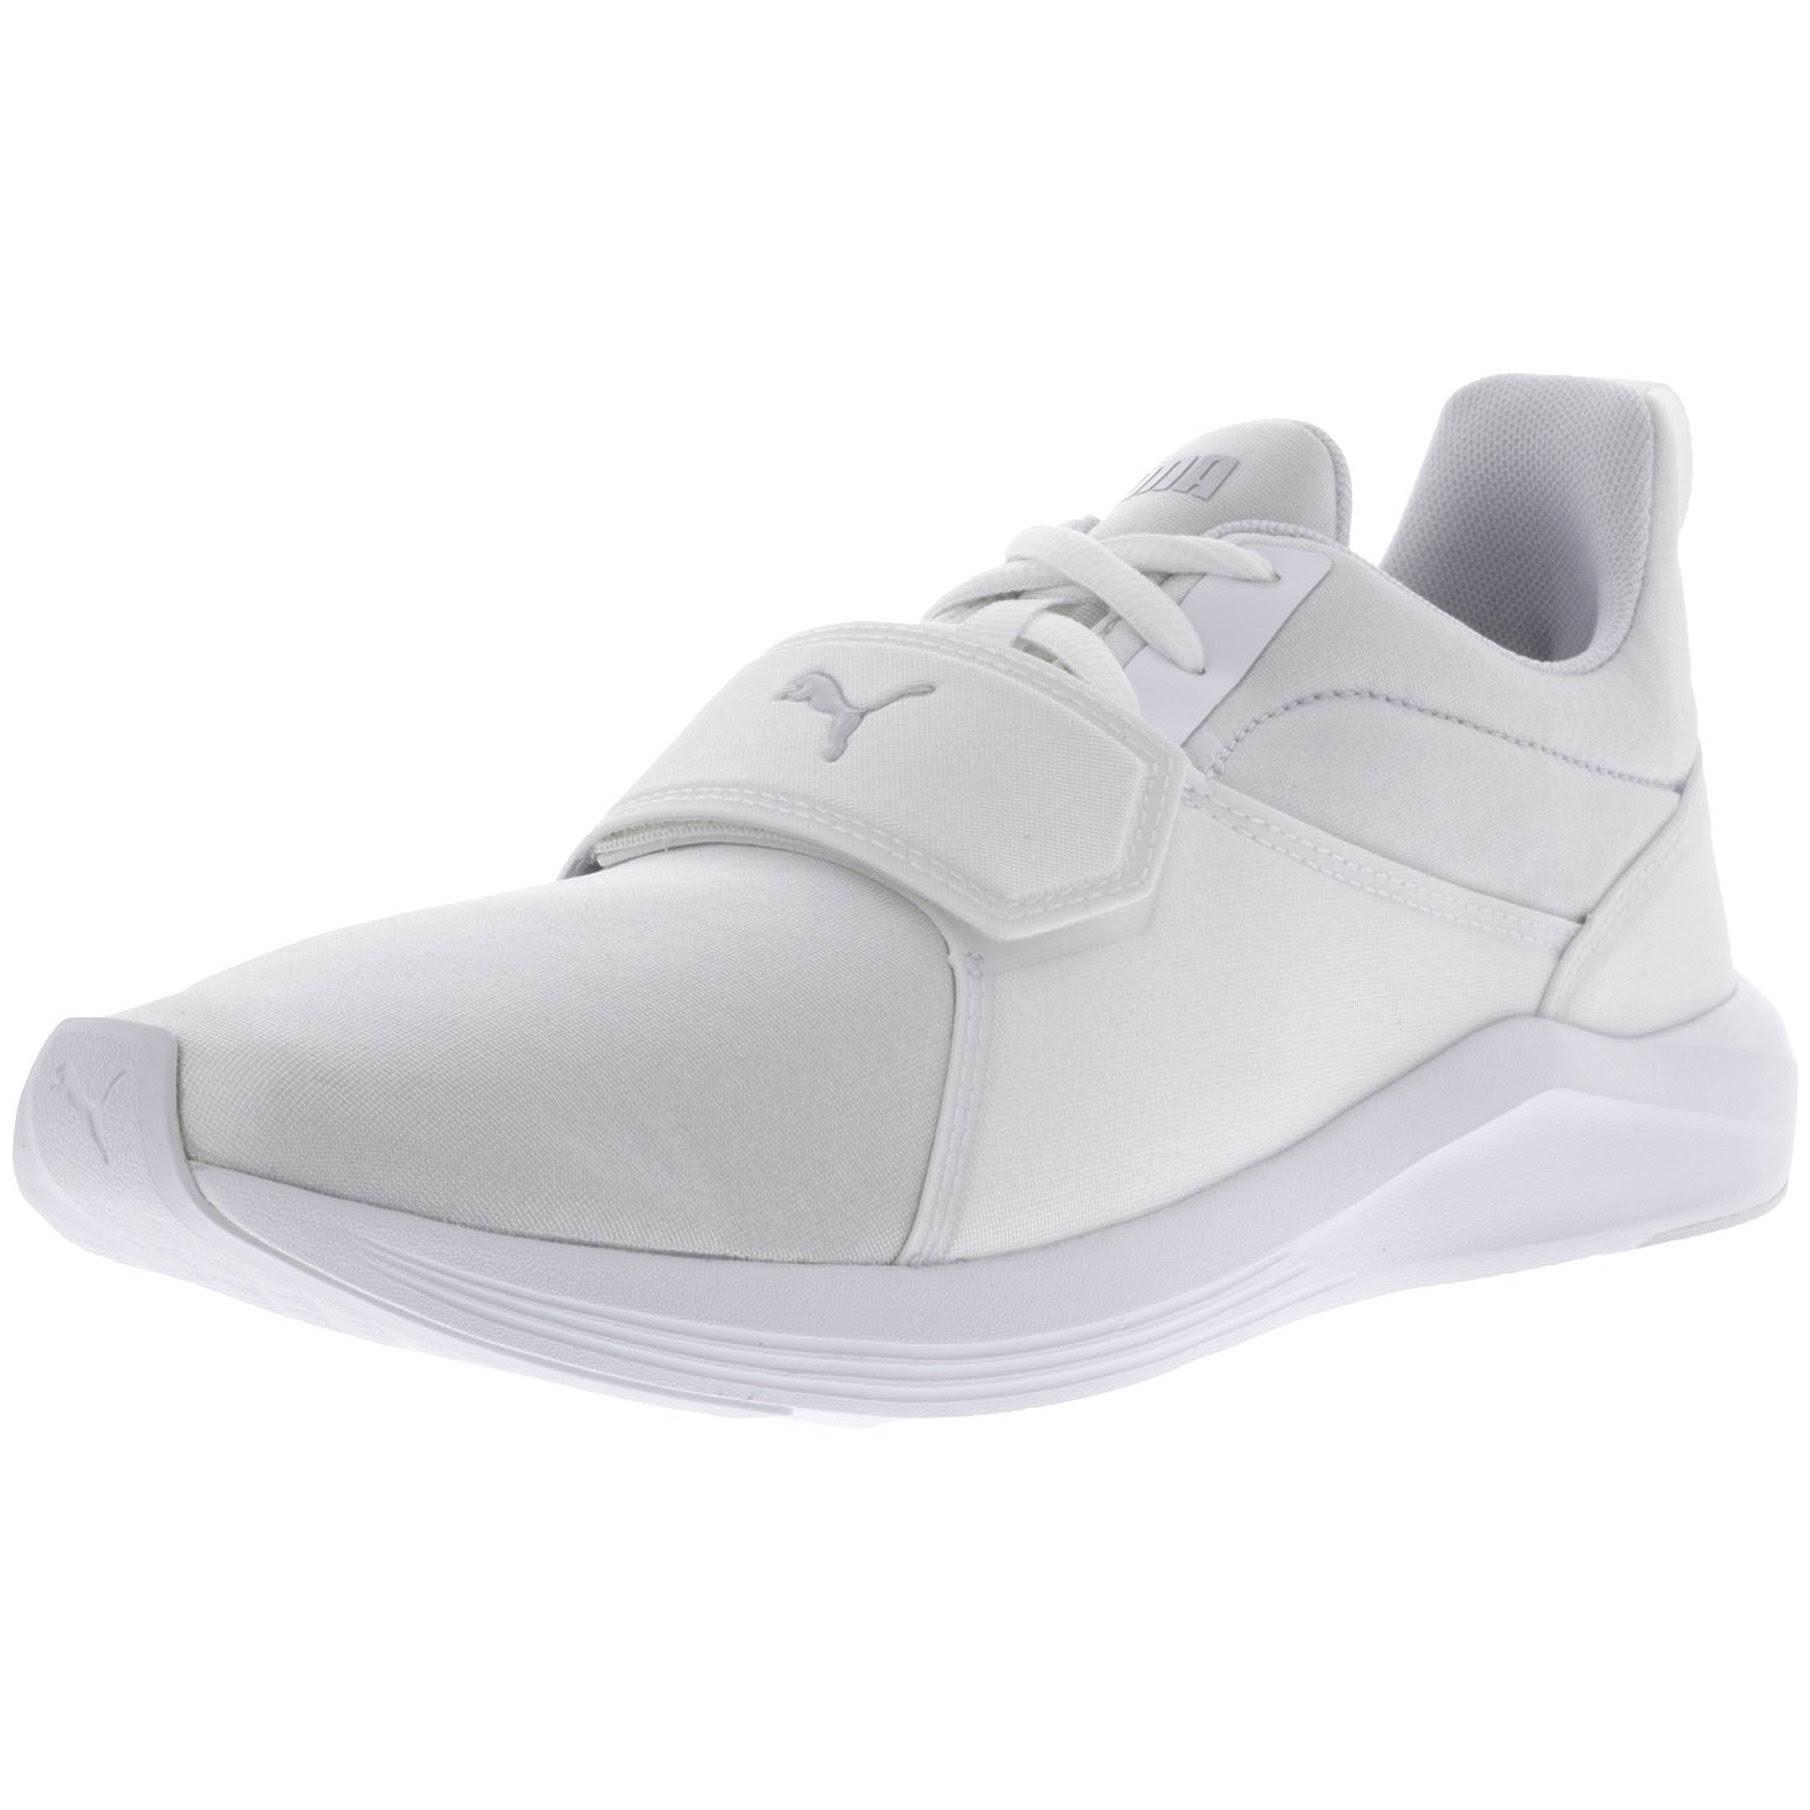 Prodigy 0 Para Zapatos Tamaño Puma Mujer De 8 Entrenamiento Blanco zvxqtg